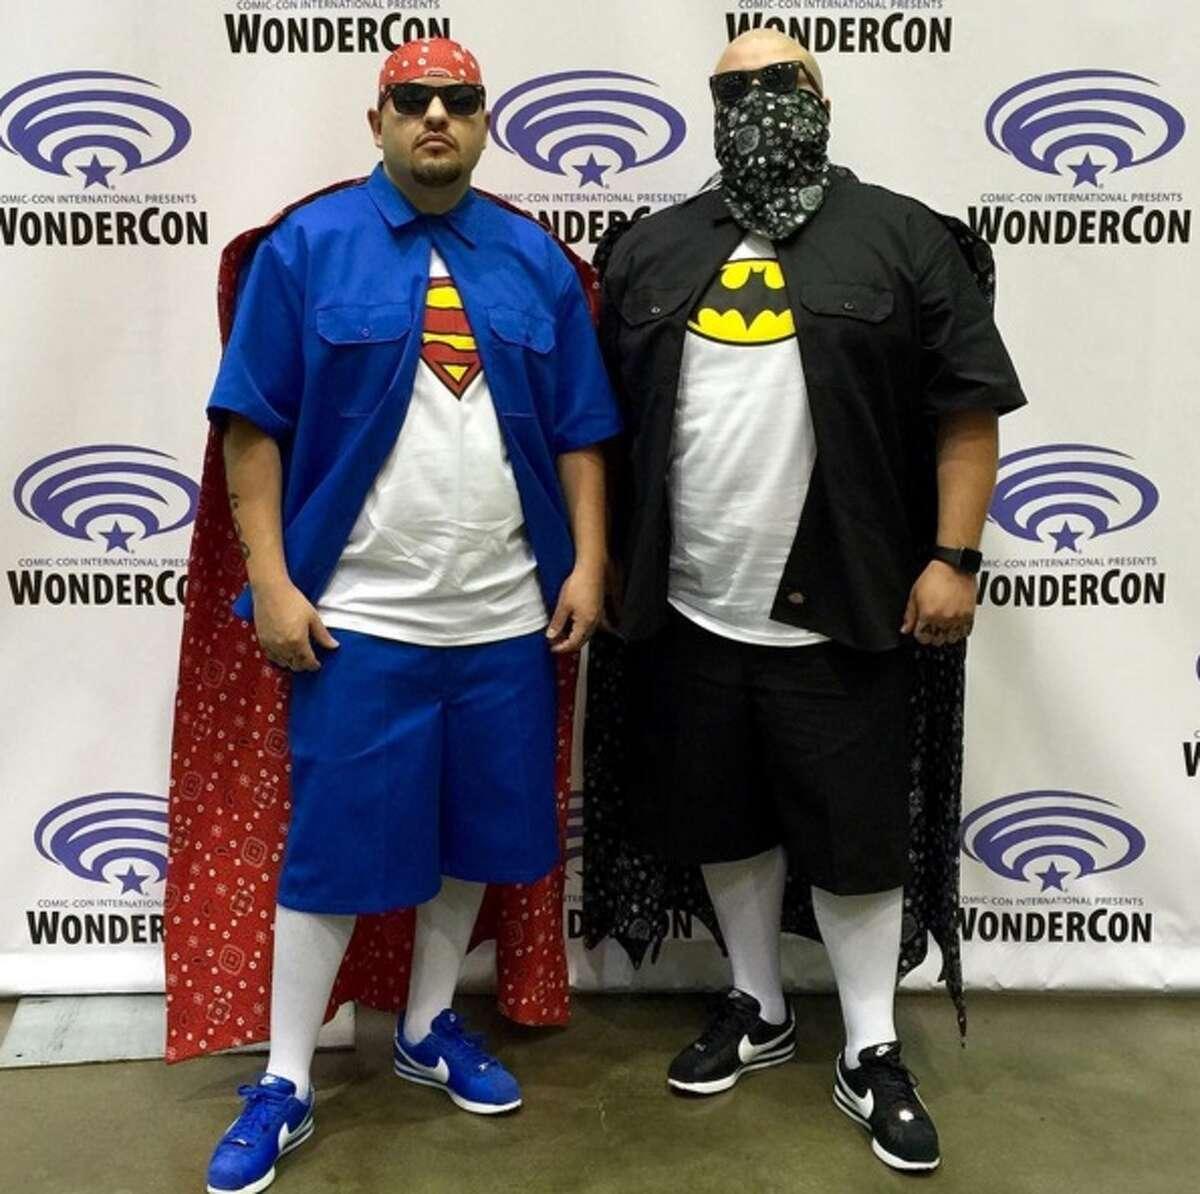 Charlie and Junior DeLira-Zepeda as Super Cholo and Vato Man.